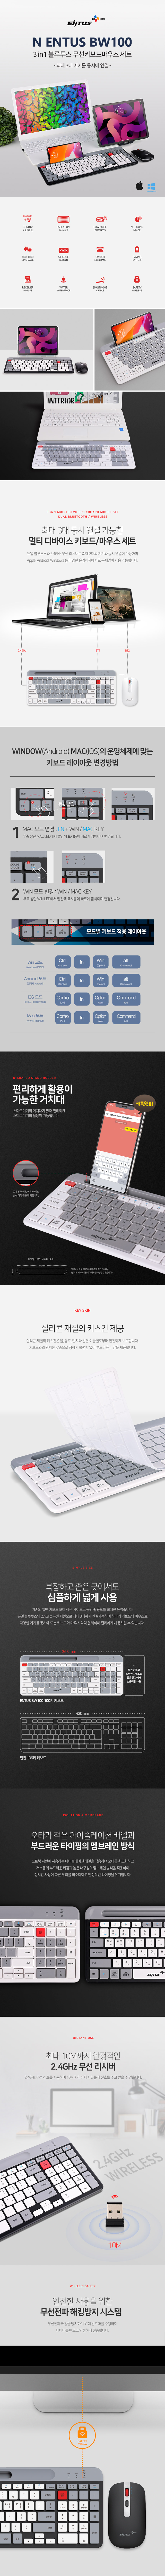 CJ ENM N ENTUS BW100 무선 키보드마우스 세트 (블랙)